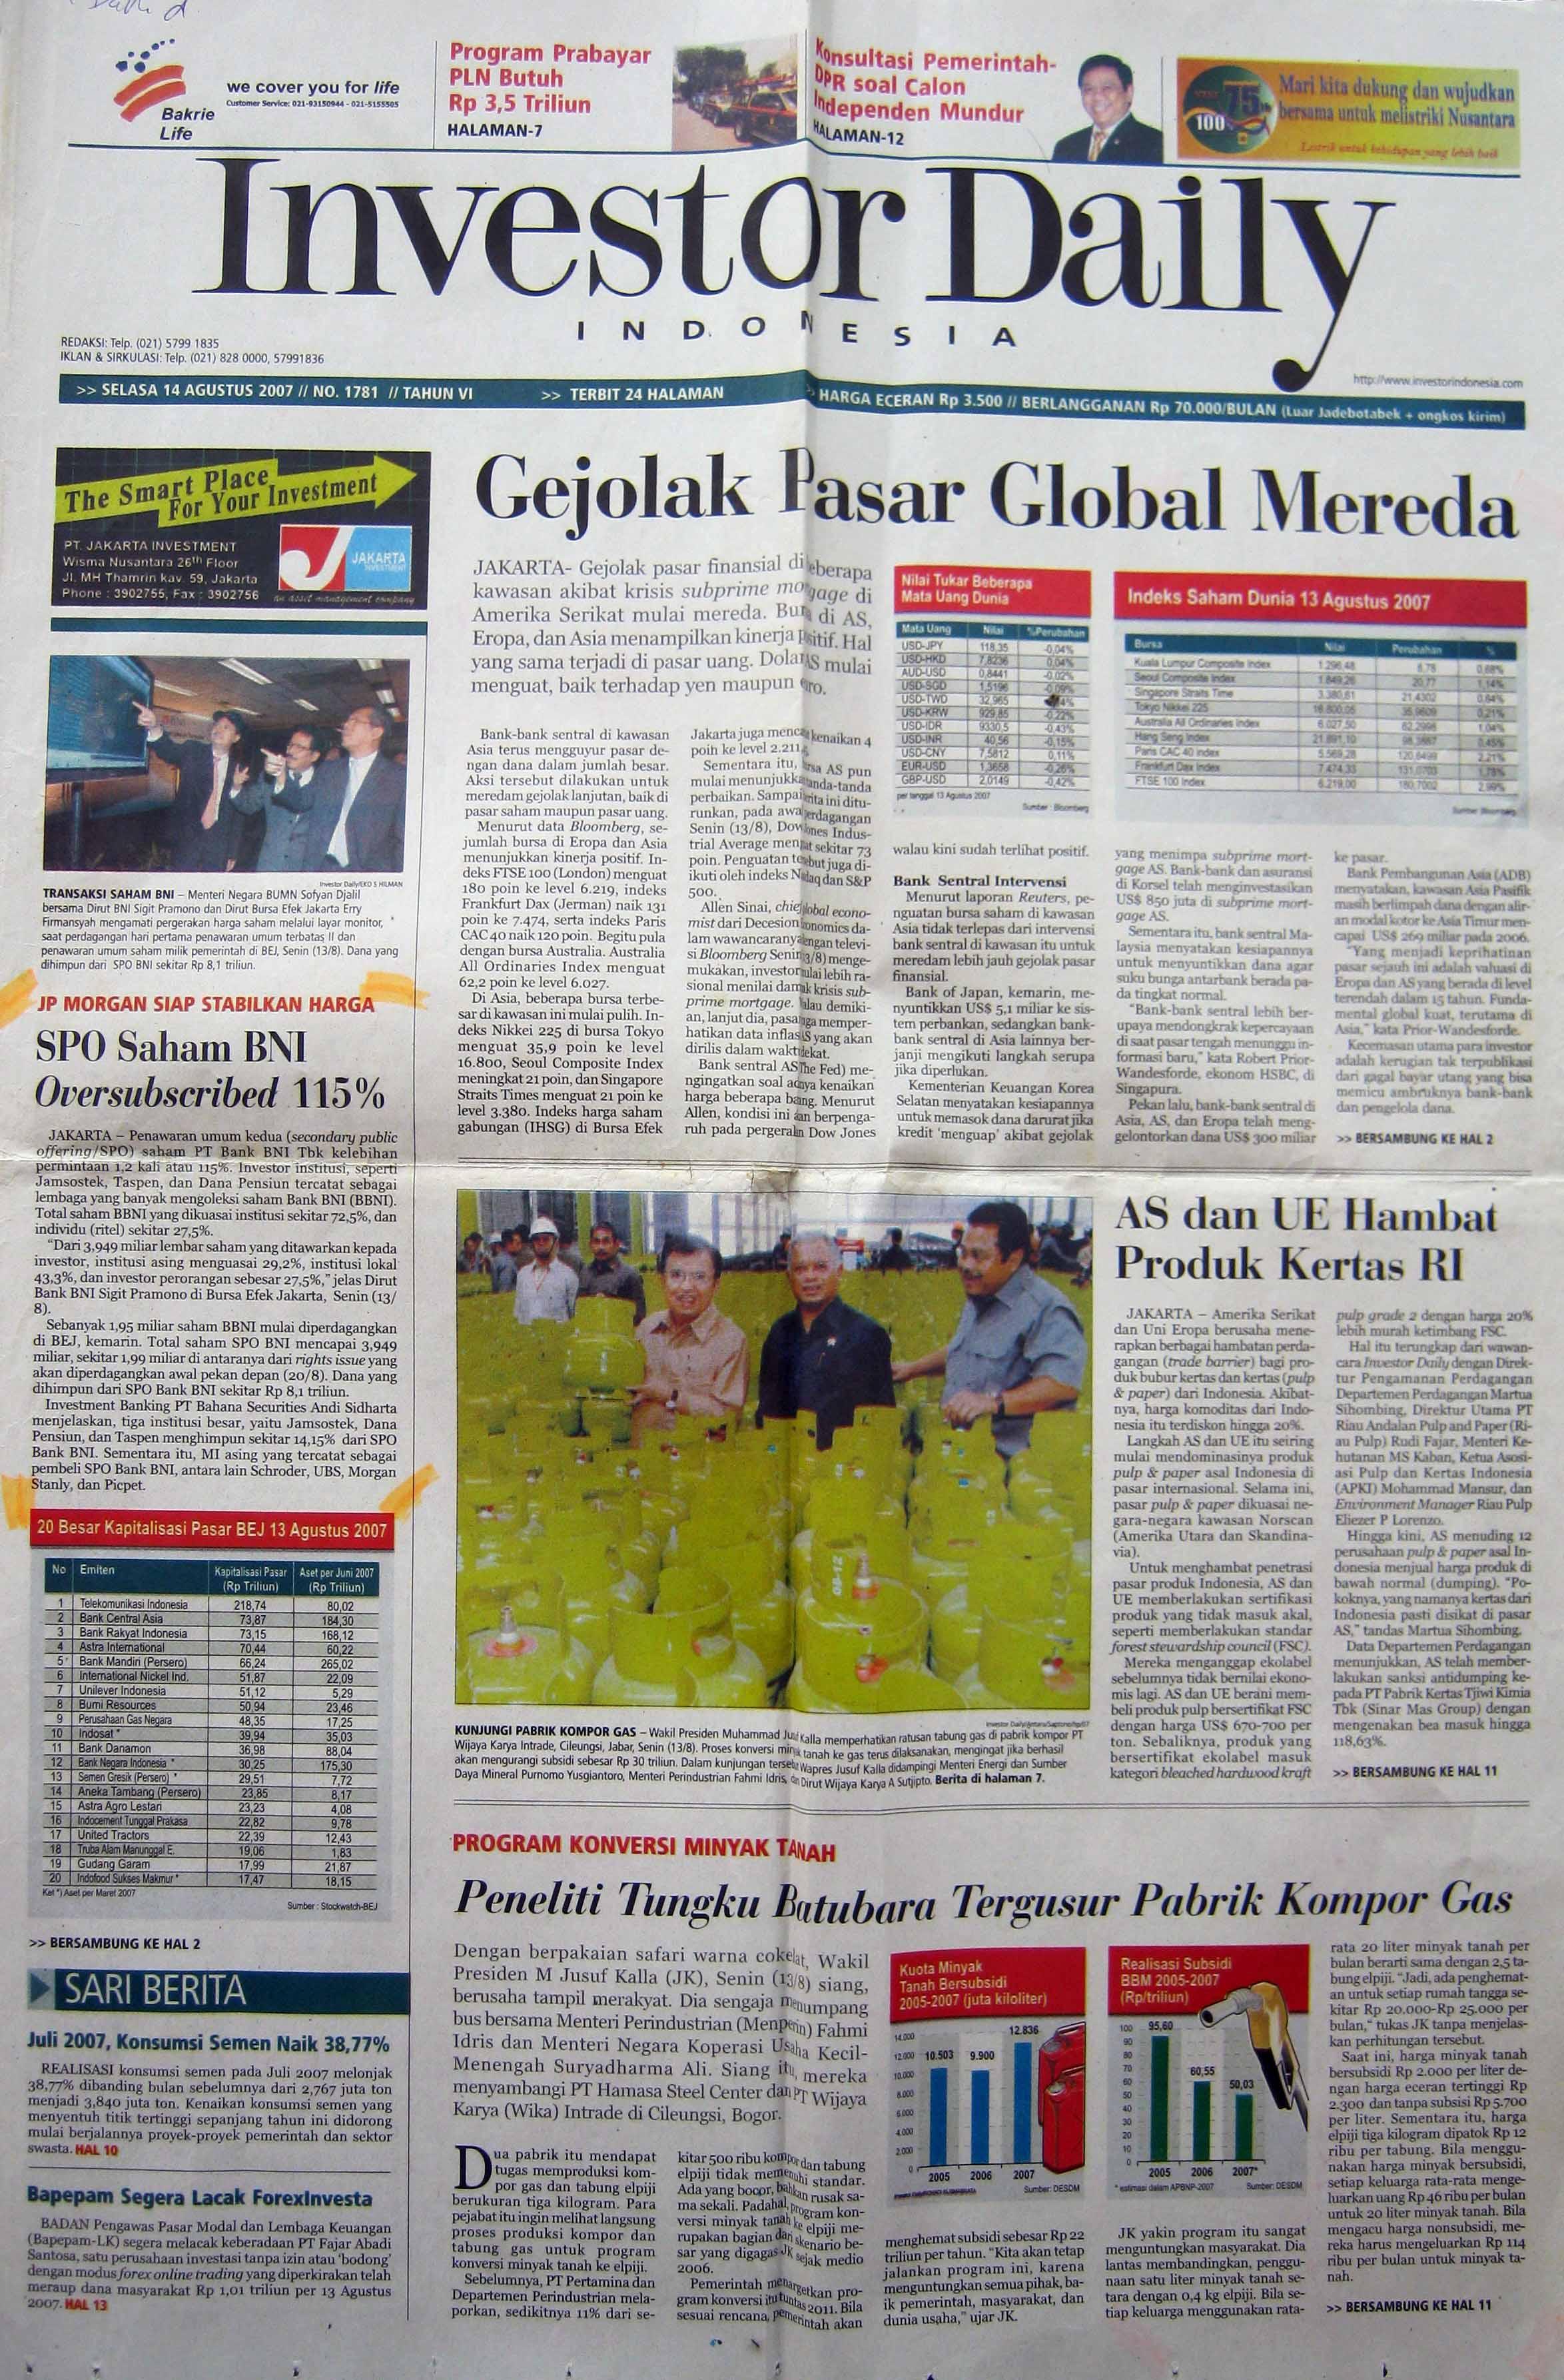 7. 14 Agustus 2007 - SPO Saham BNI Oversubscribed  115%